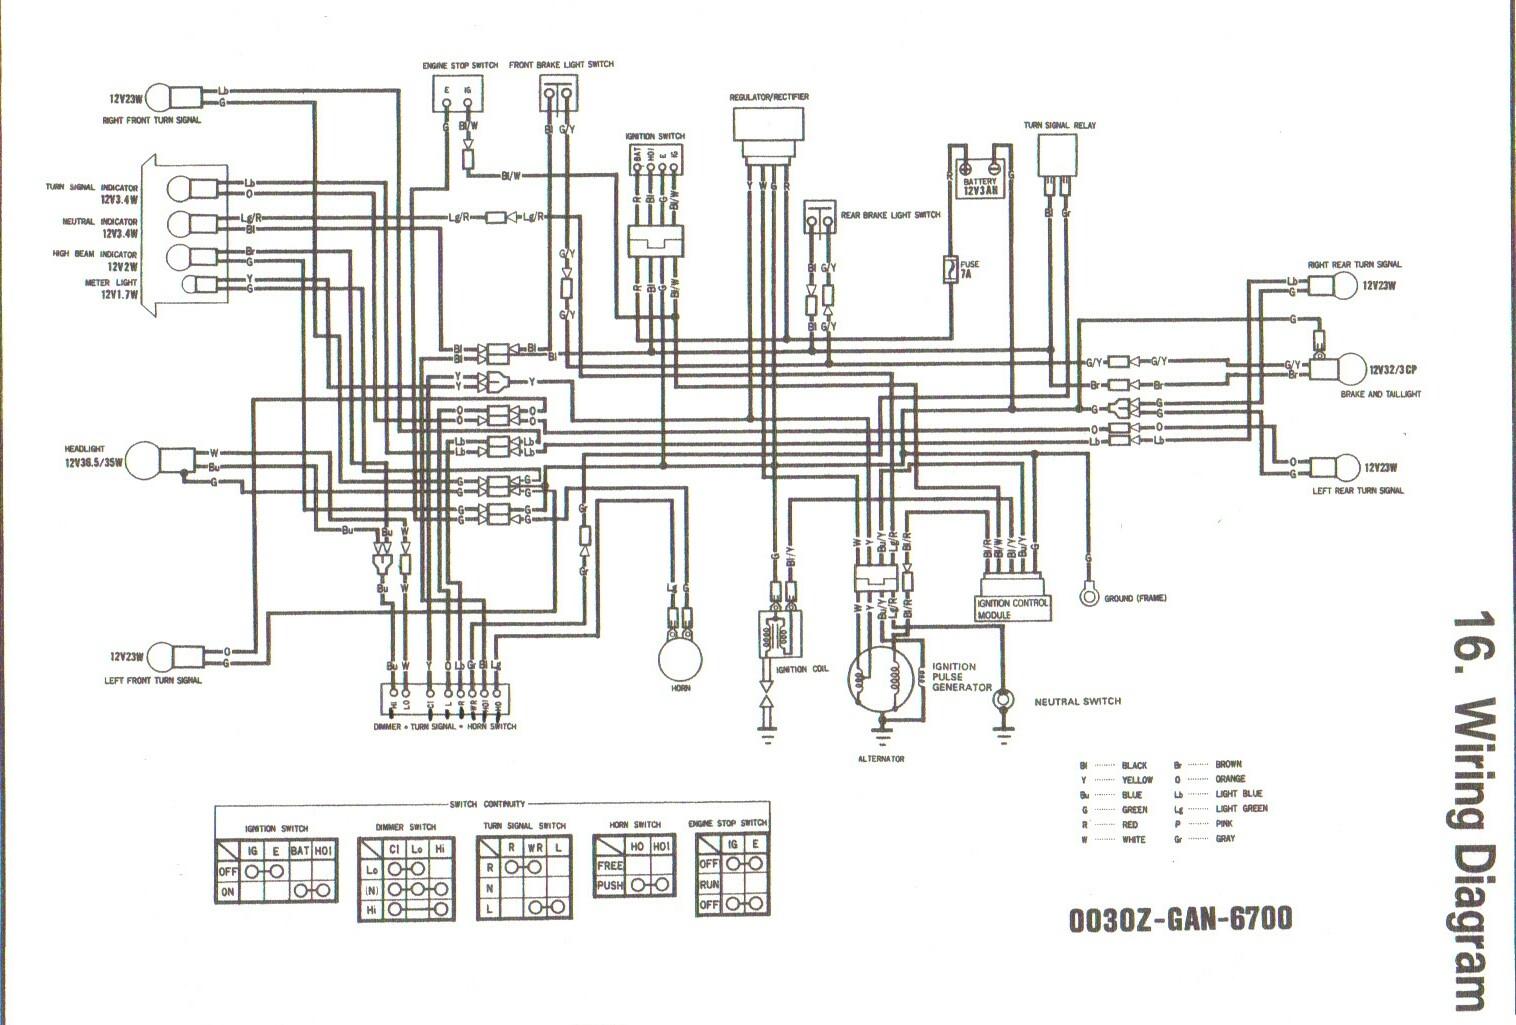 Phenomenal Honda Cl70 Wiring Wiring Diagram Data Wiring Cloud Licukshollocom